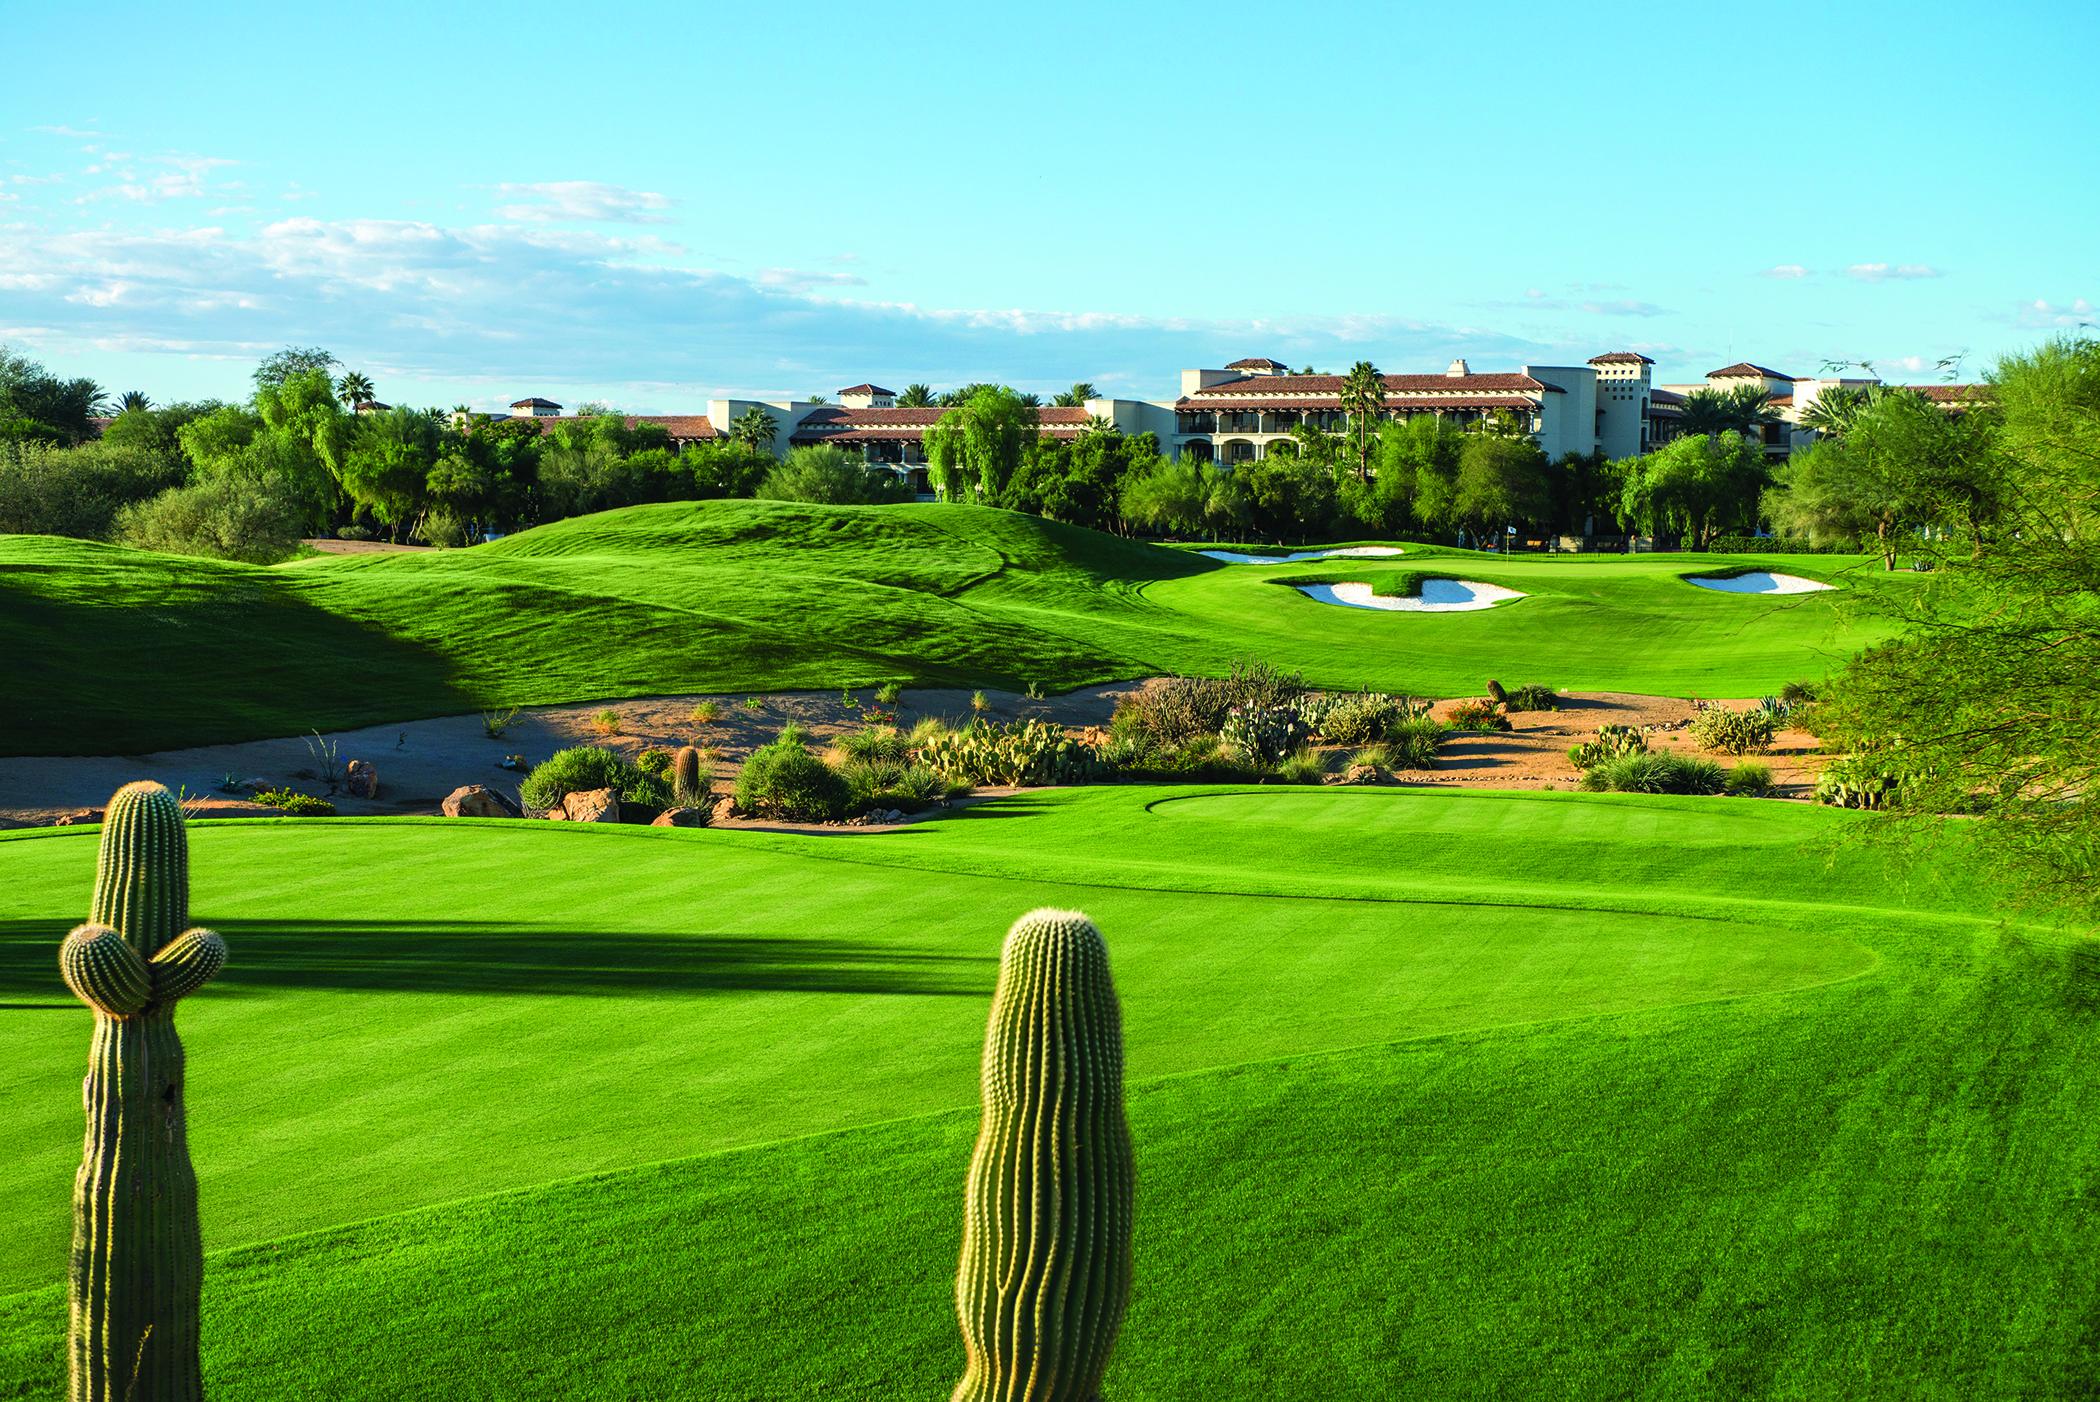 TPC Scottsdale Stadium Course Shoot-11/2014 Tom Weiskoph Architect